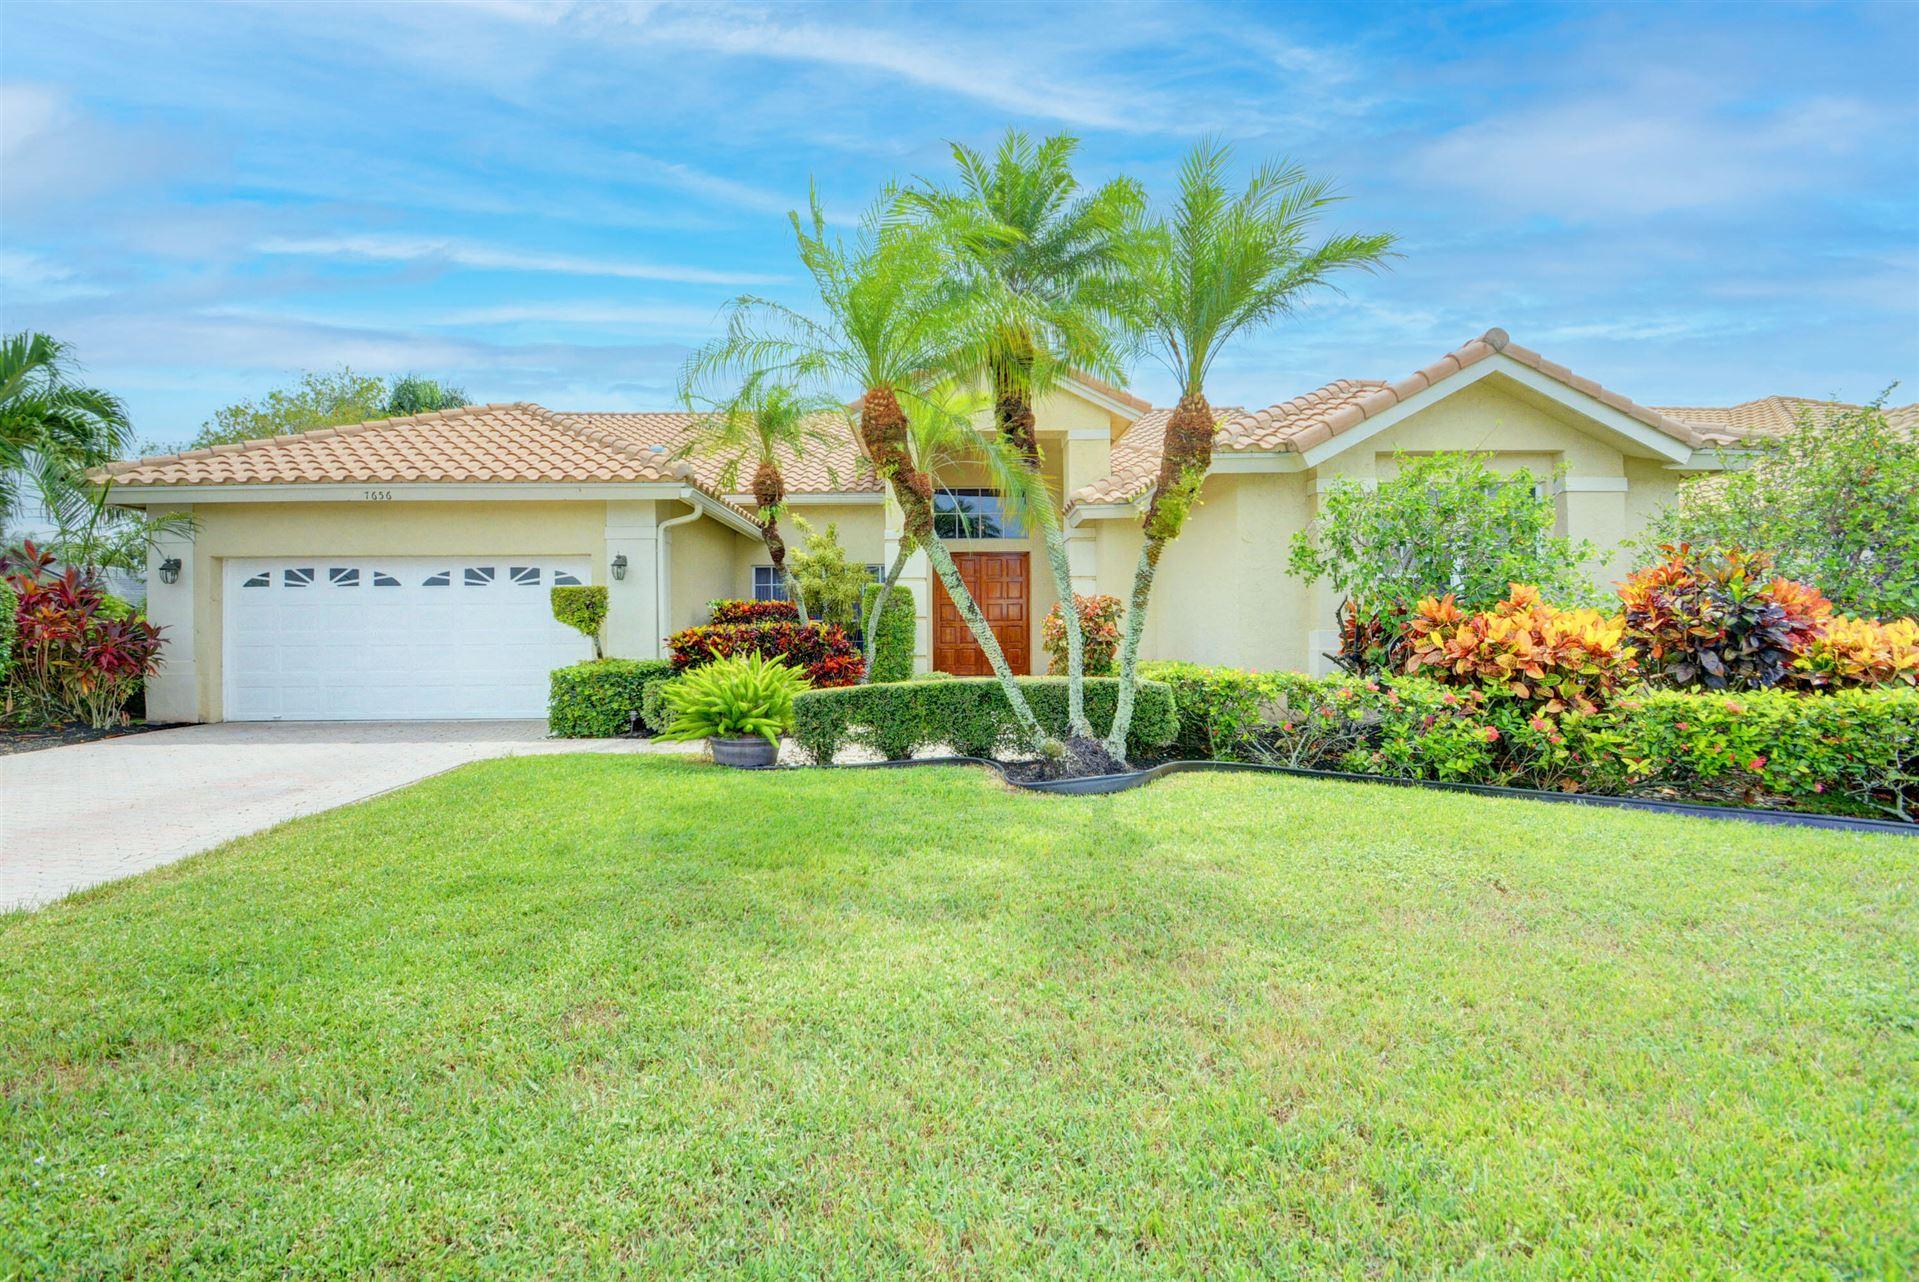 7656 Bridlington Drive, Boynton Beach, FL 33472 - #: RX-10741651